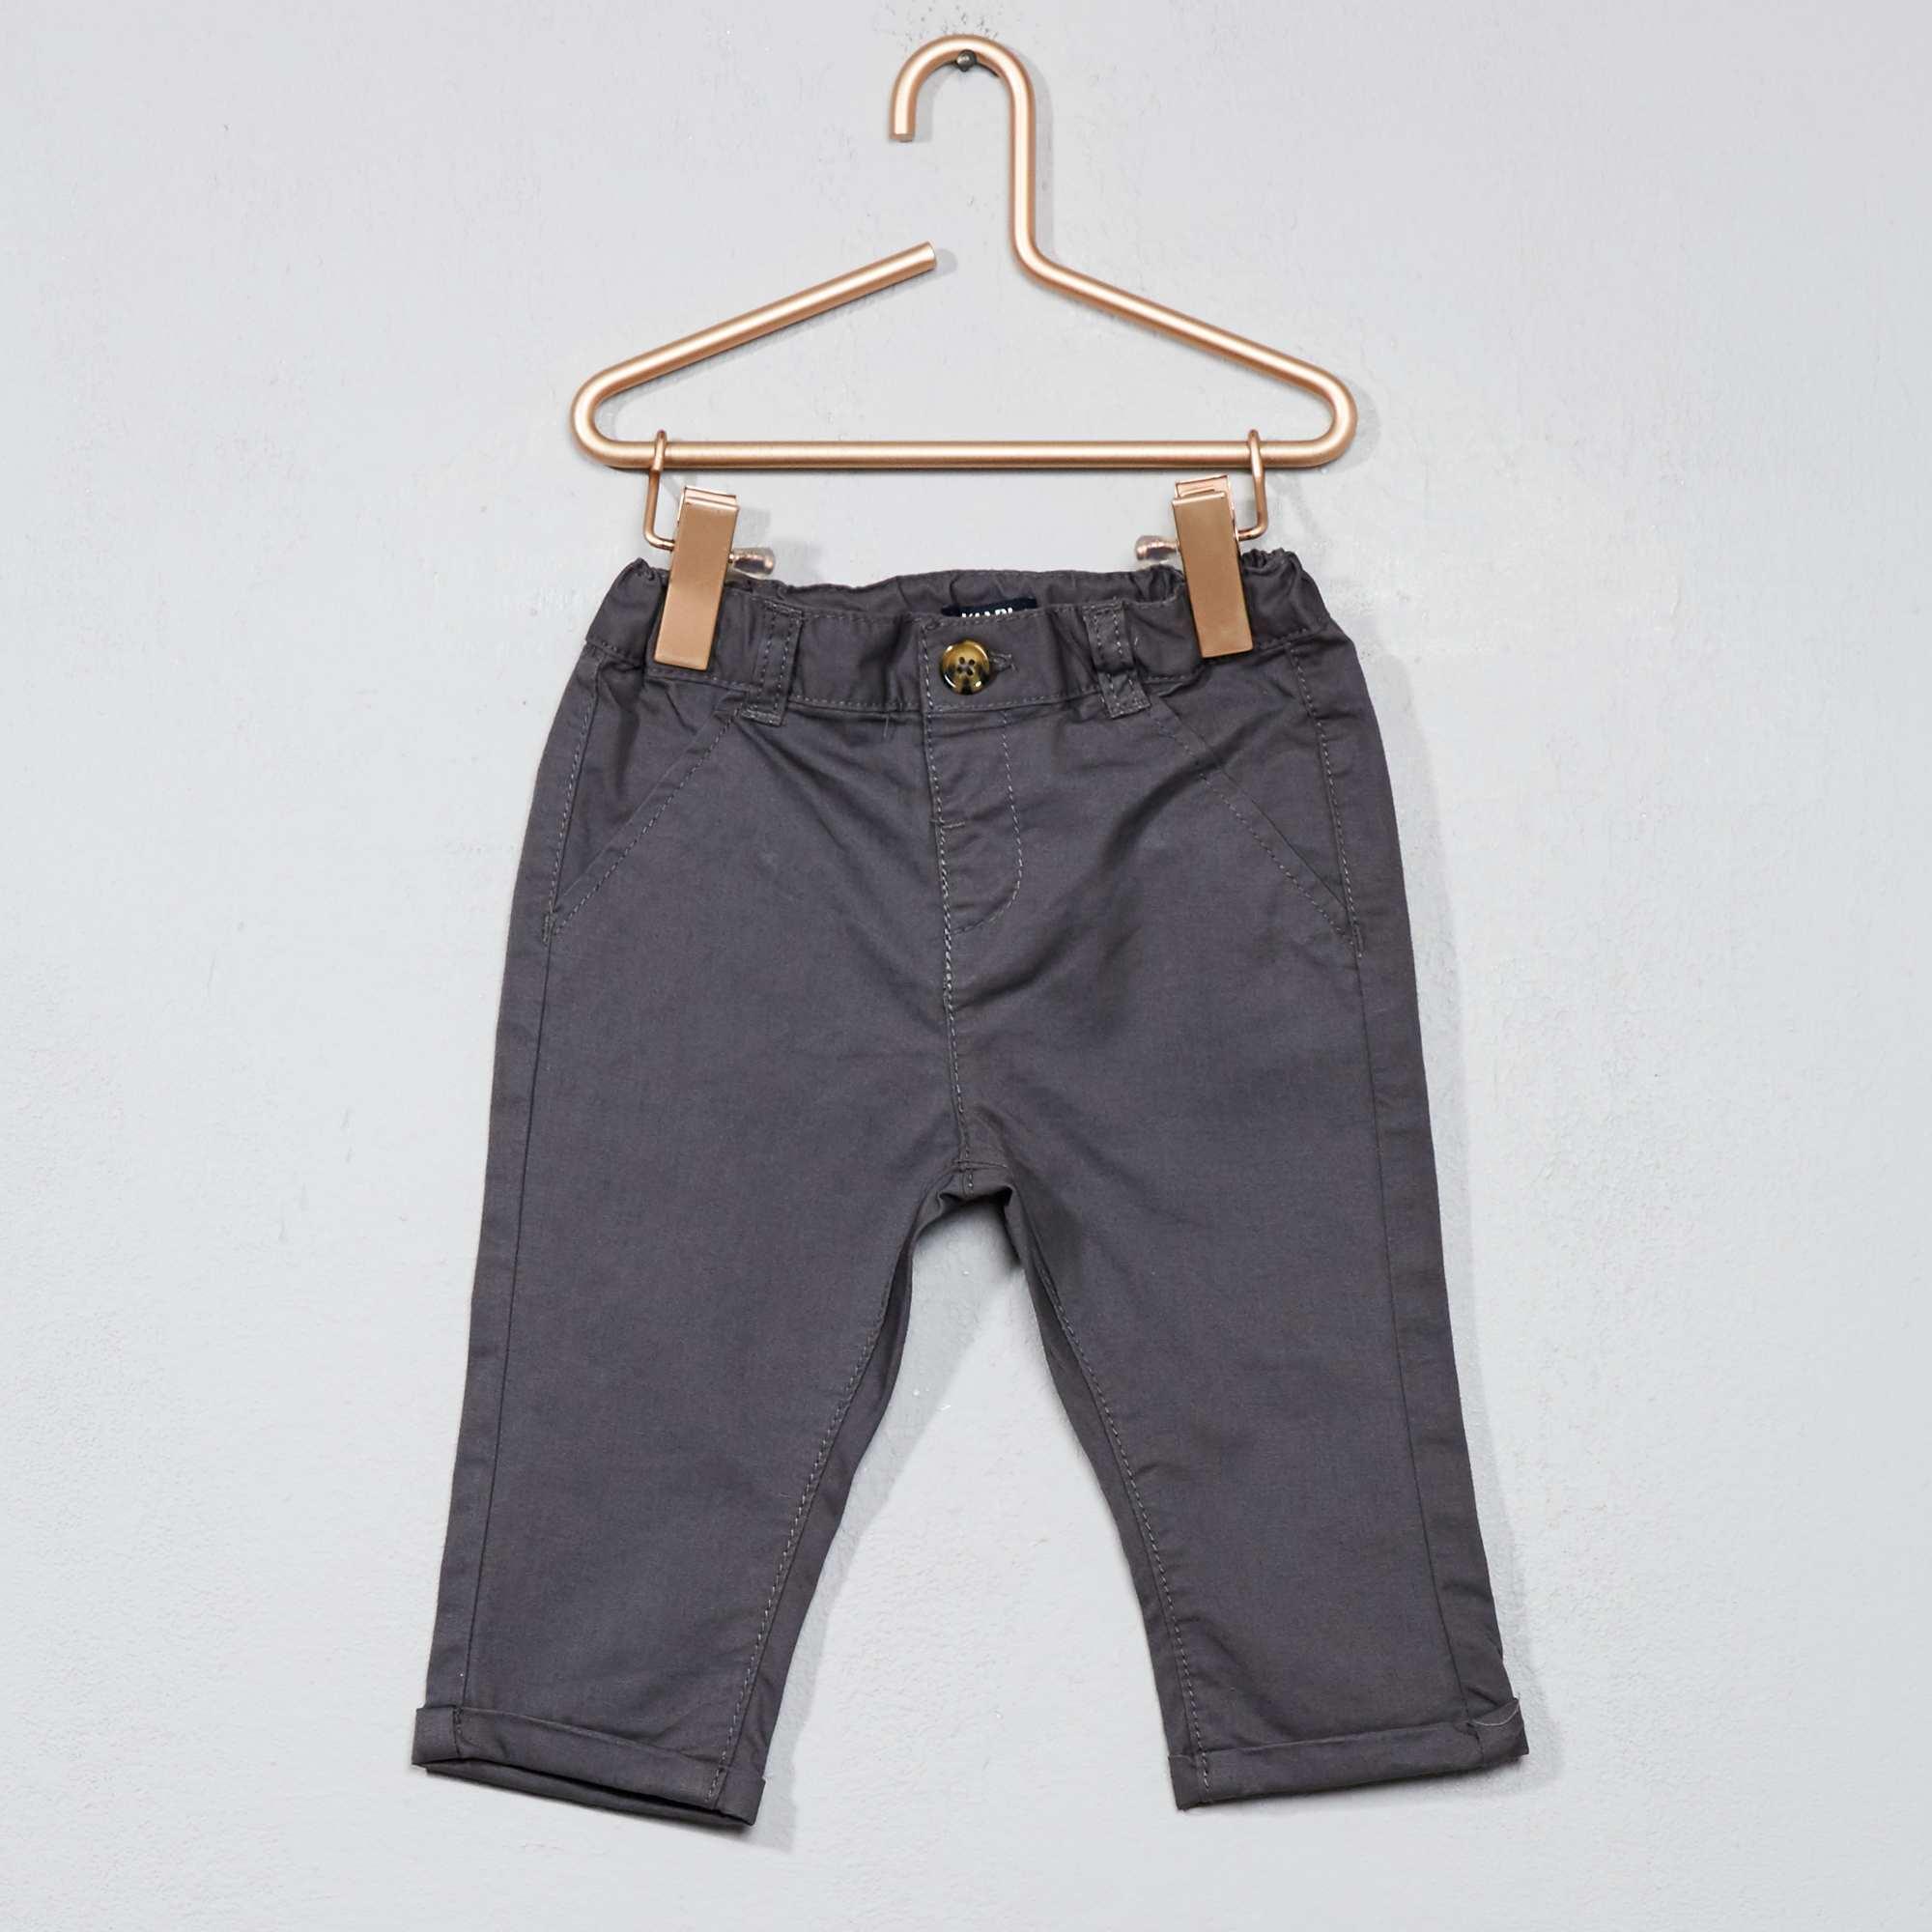 pantalon chino b b gar on gris kiabi 7 00. Black Bedroom Furniture Sets. Home Design Ideas